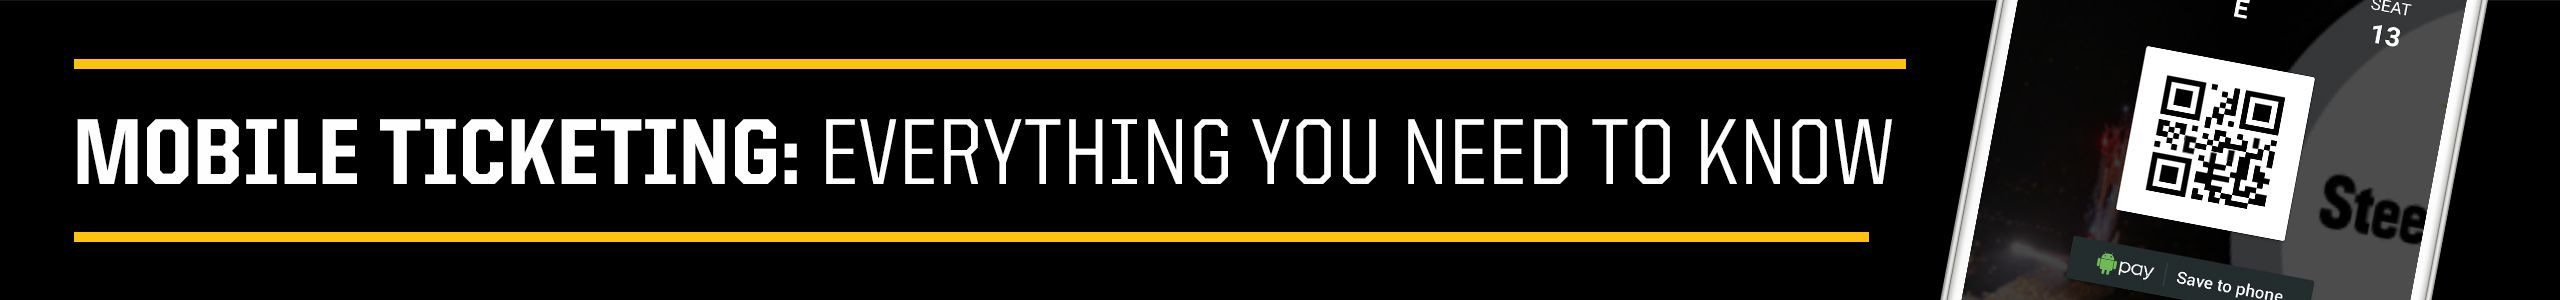 Steelers_TicketPage_Header